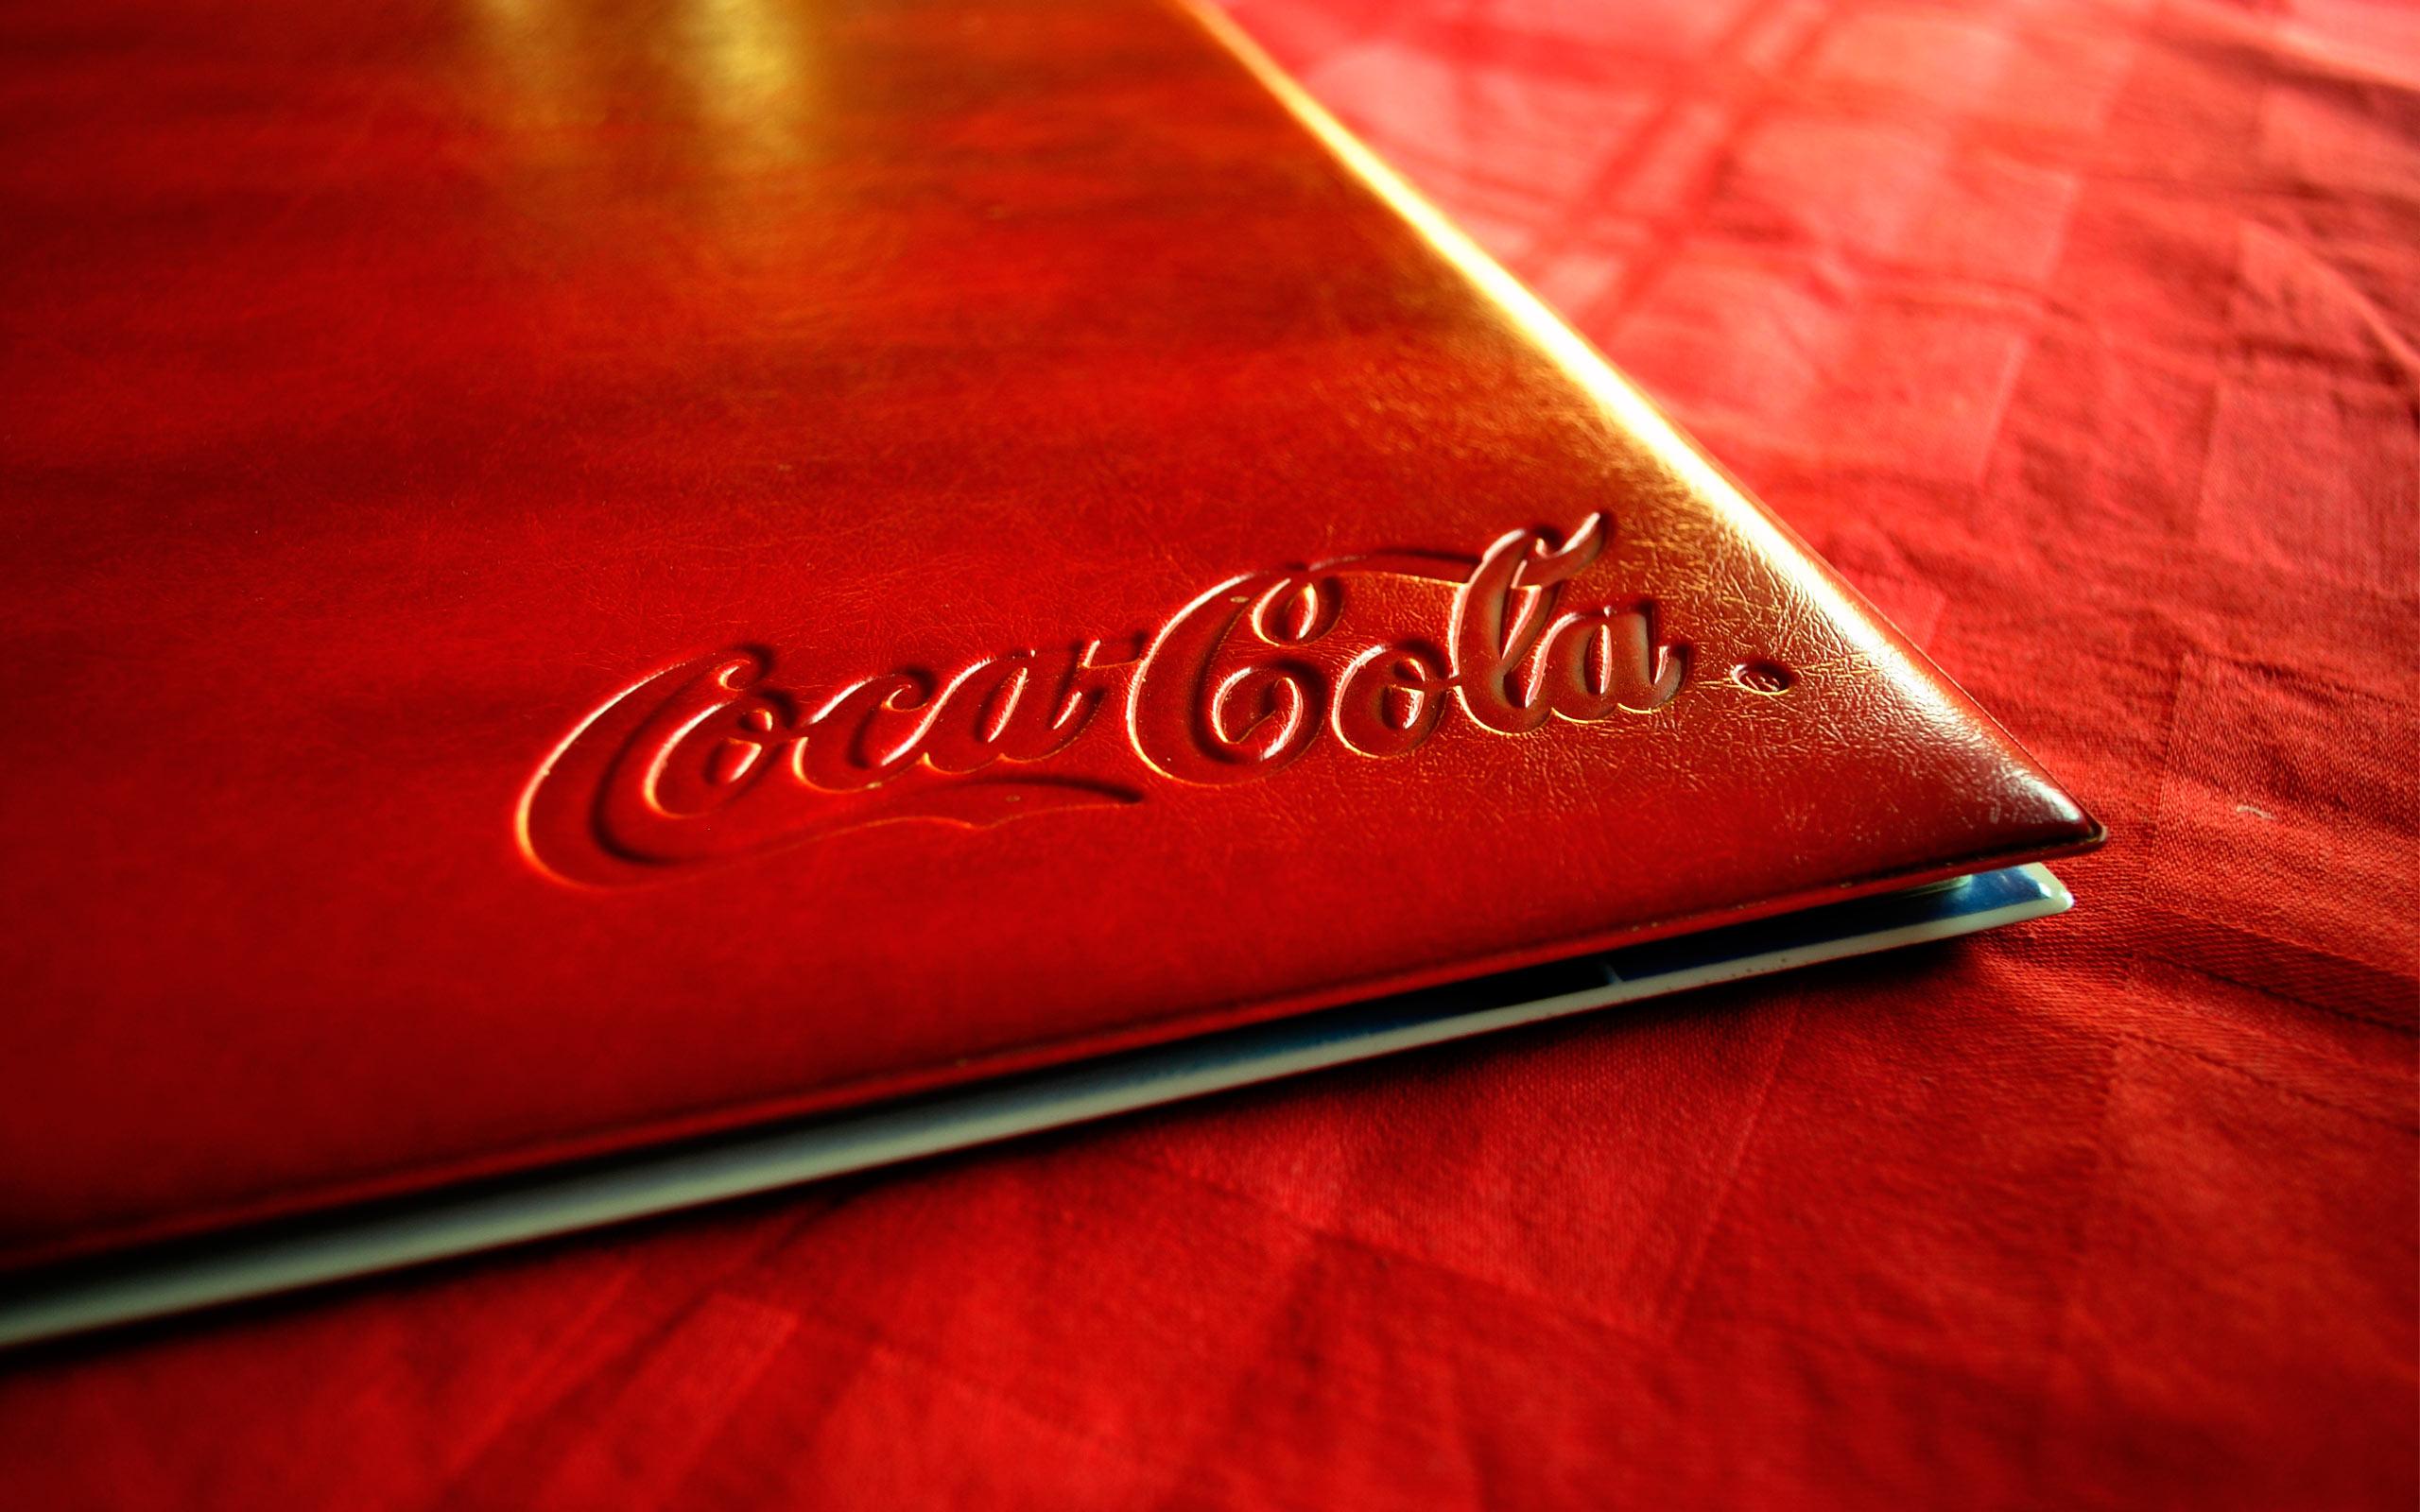 Coca Cola Hd Wallpaper Sfondi 2560x1600 Id491664 Wallpaper